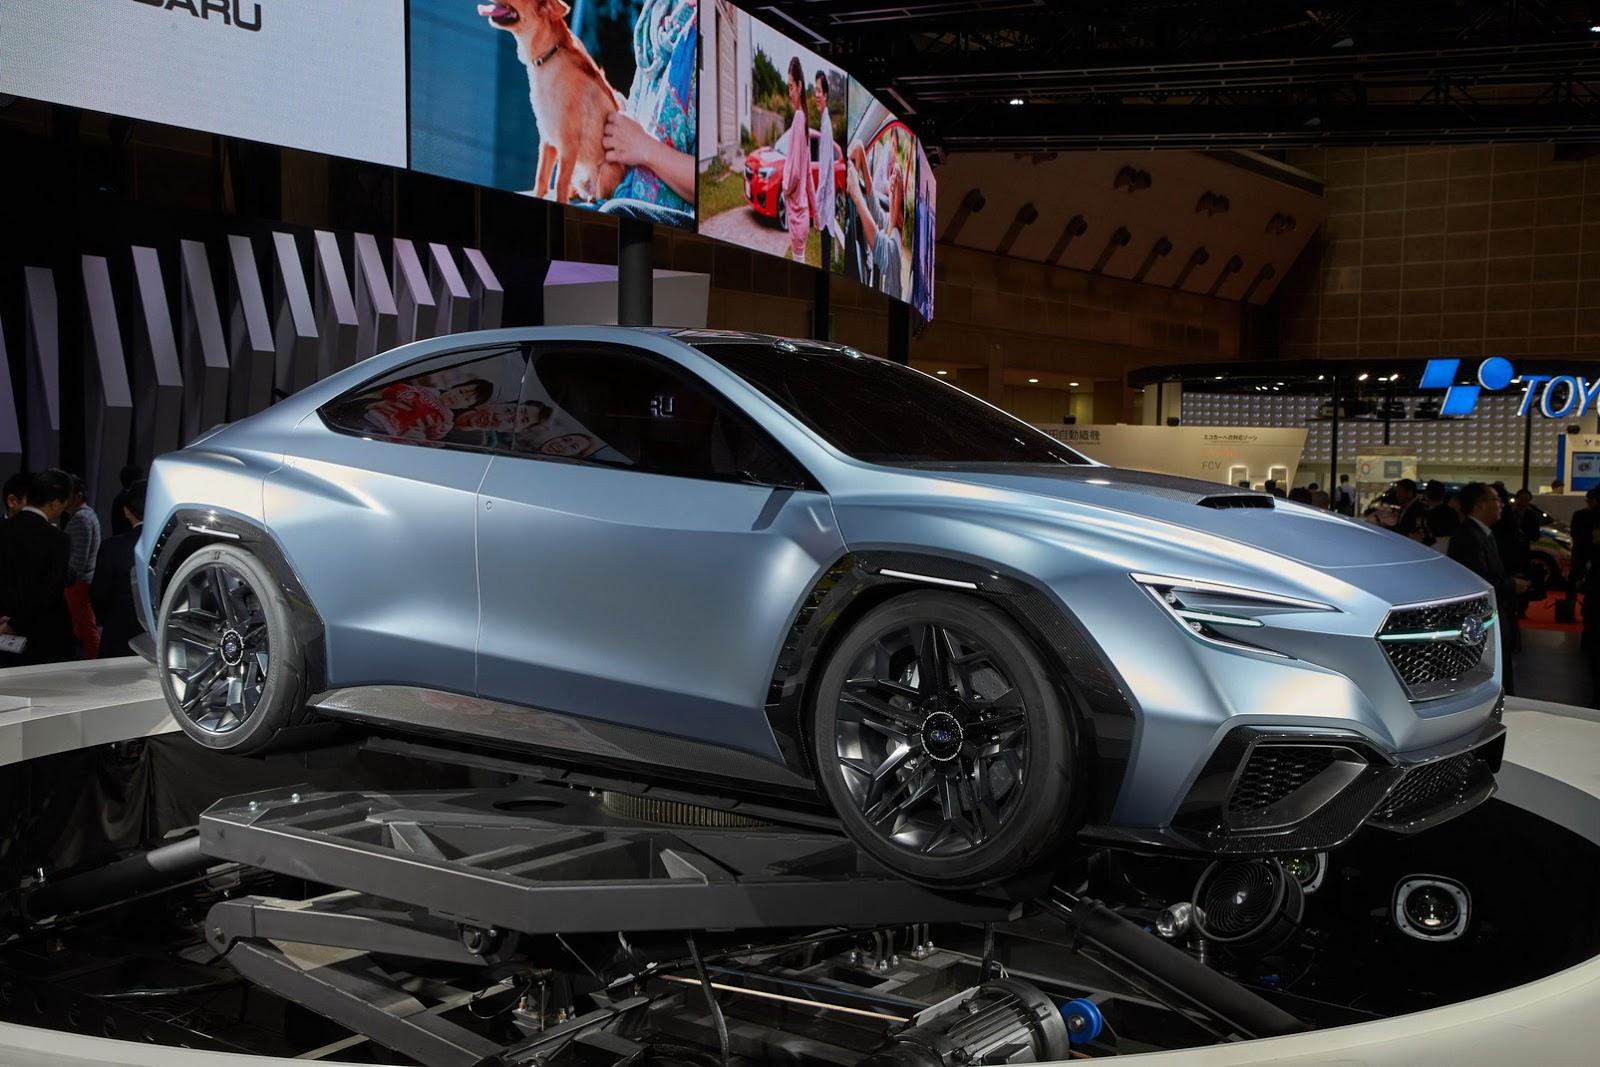 Subaru Says Next Wrx Will Look Like Viziv Concept Carscoops